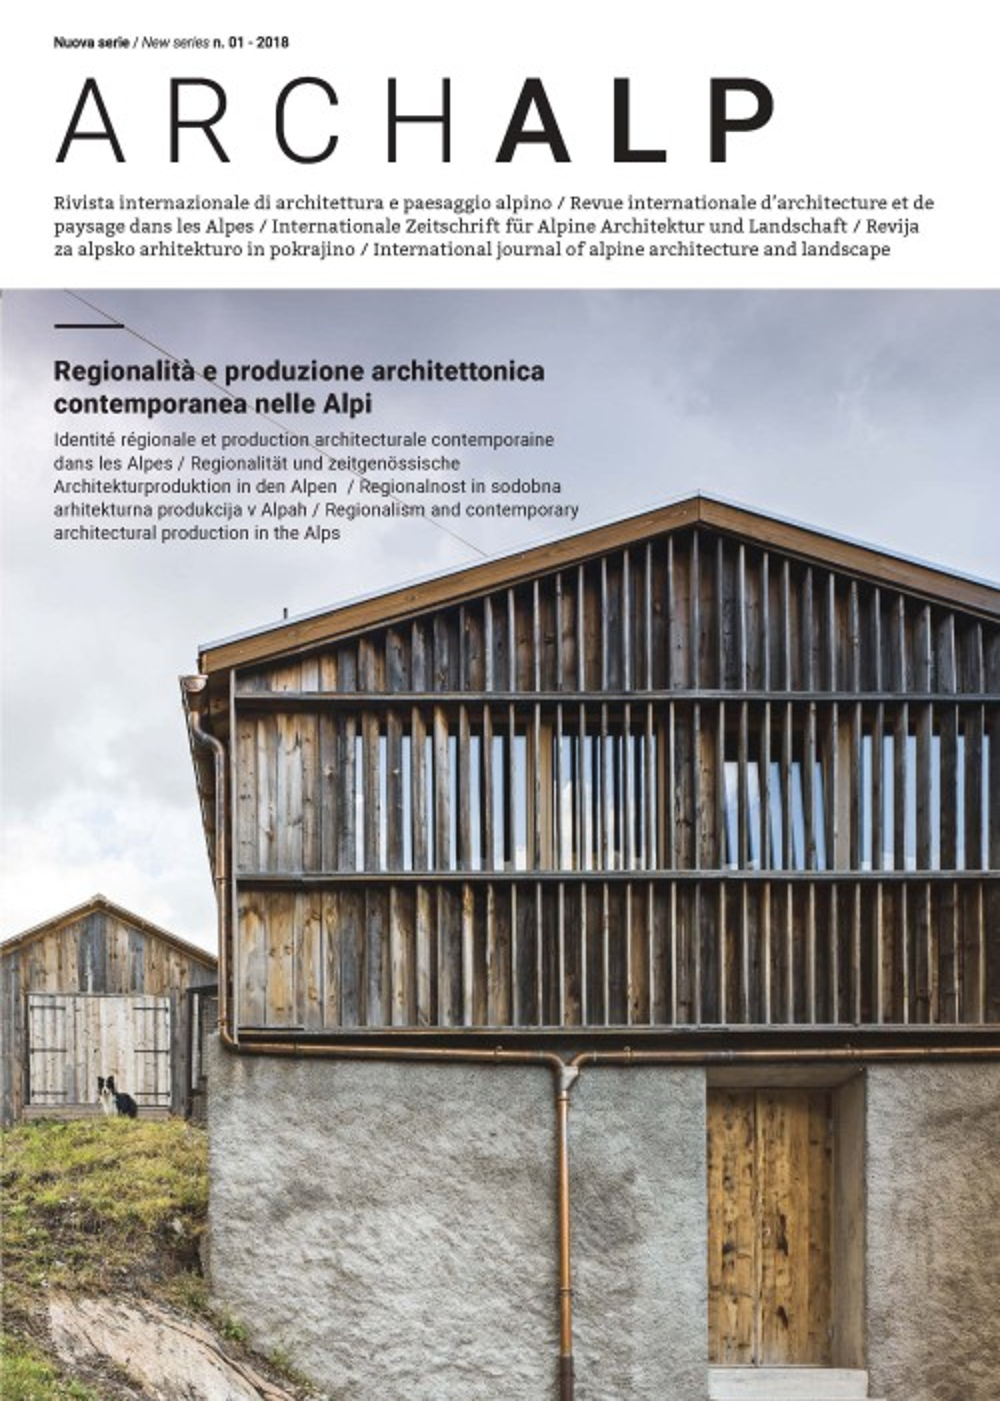 Archalp - Bononia University Press